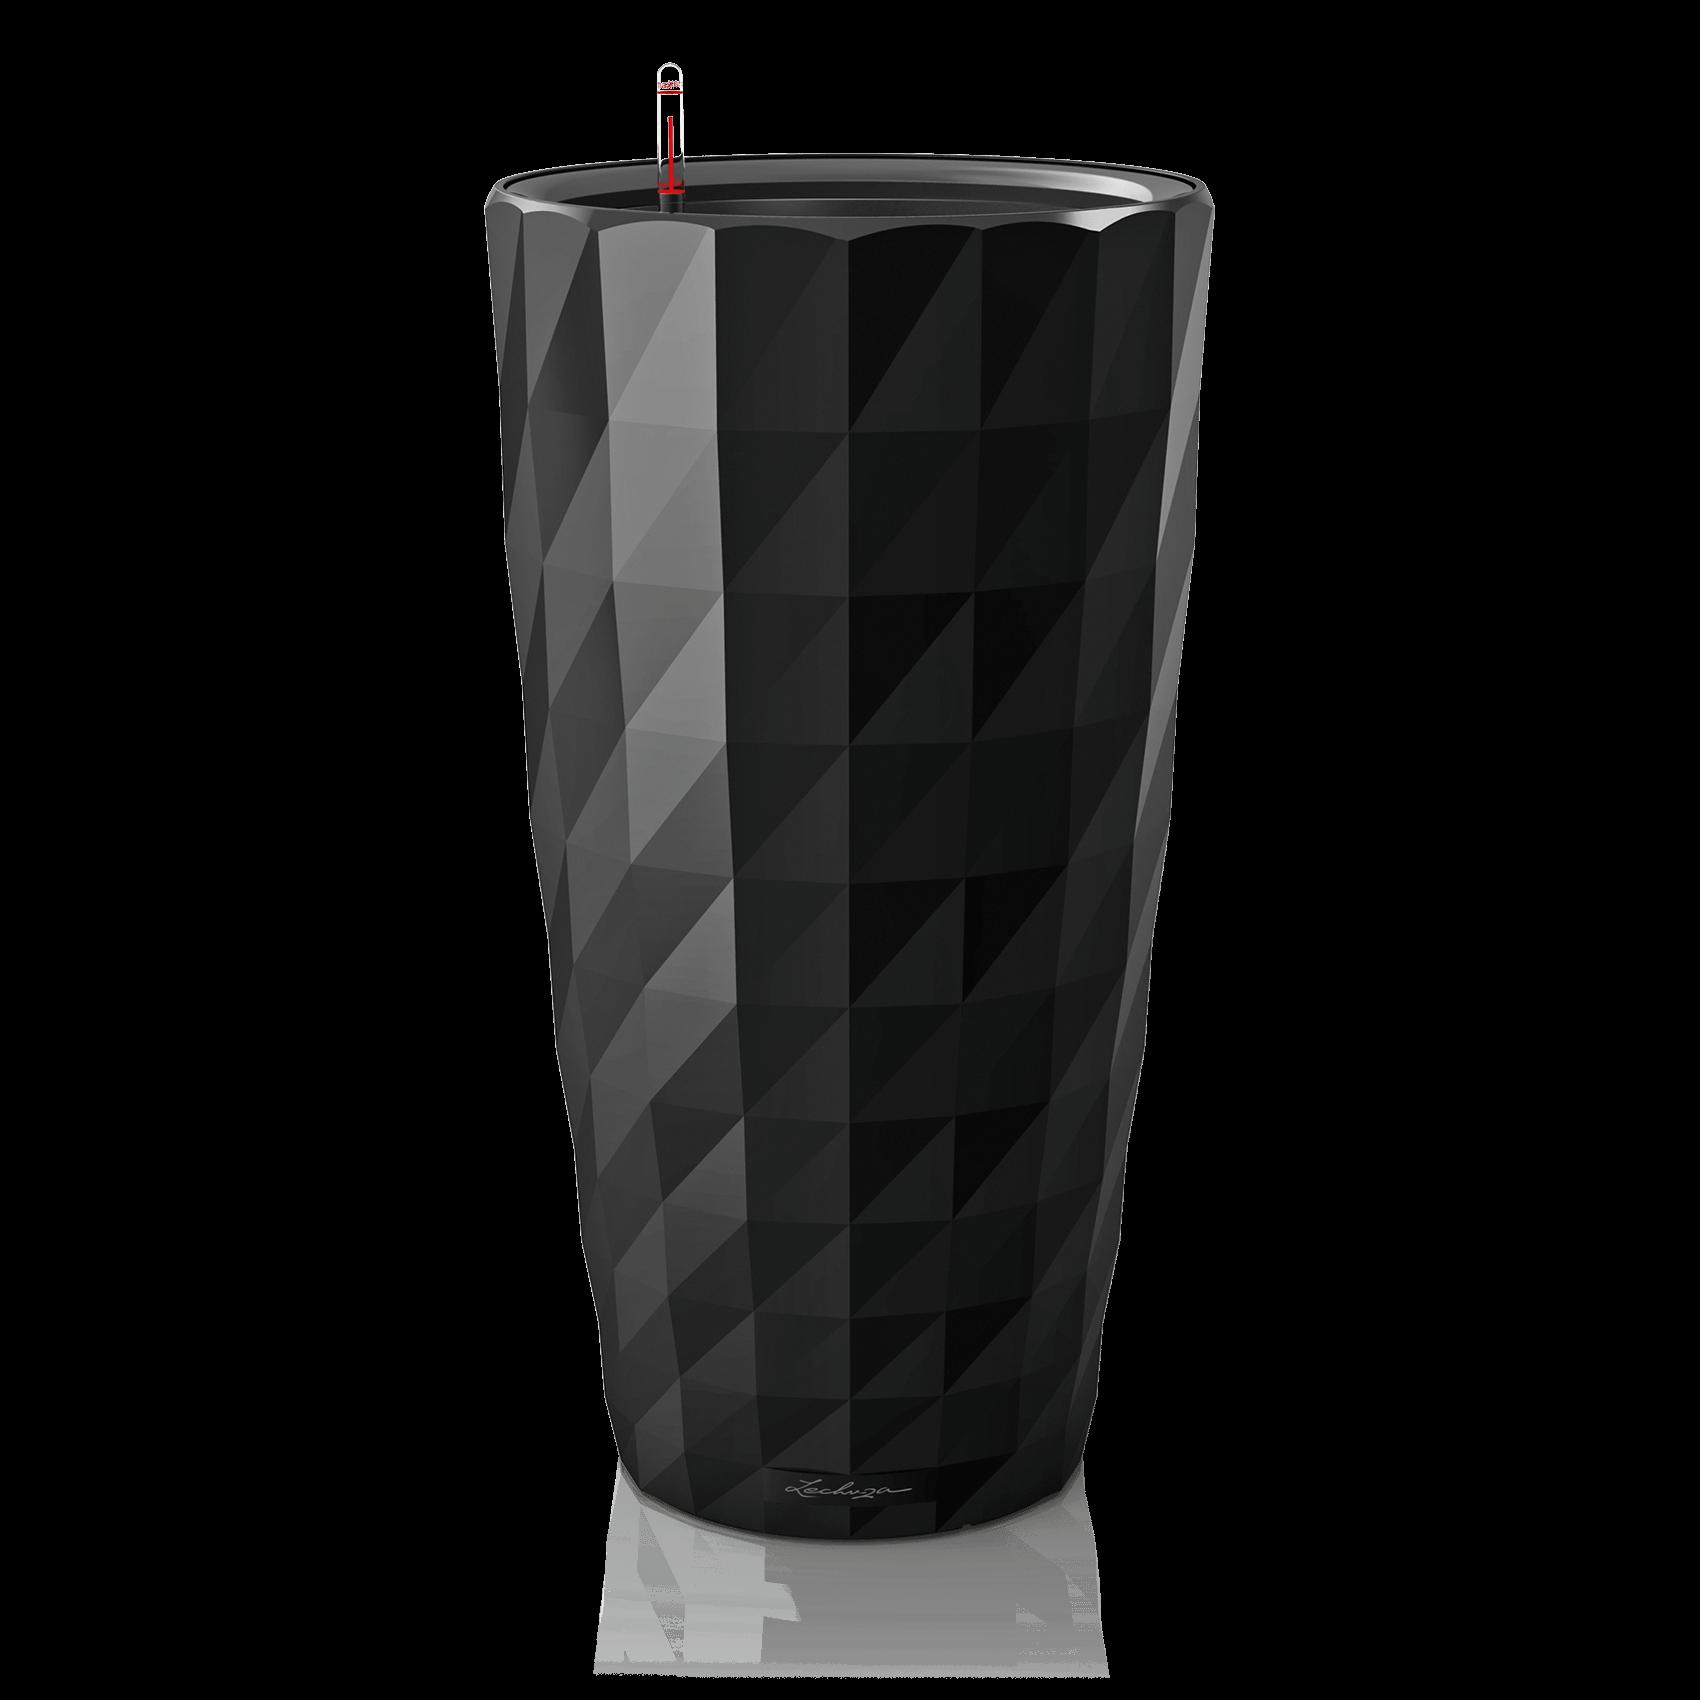 DIAMANTE 40 black high-gloss